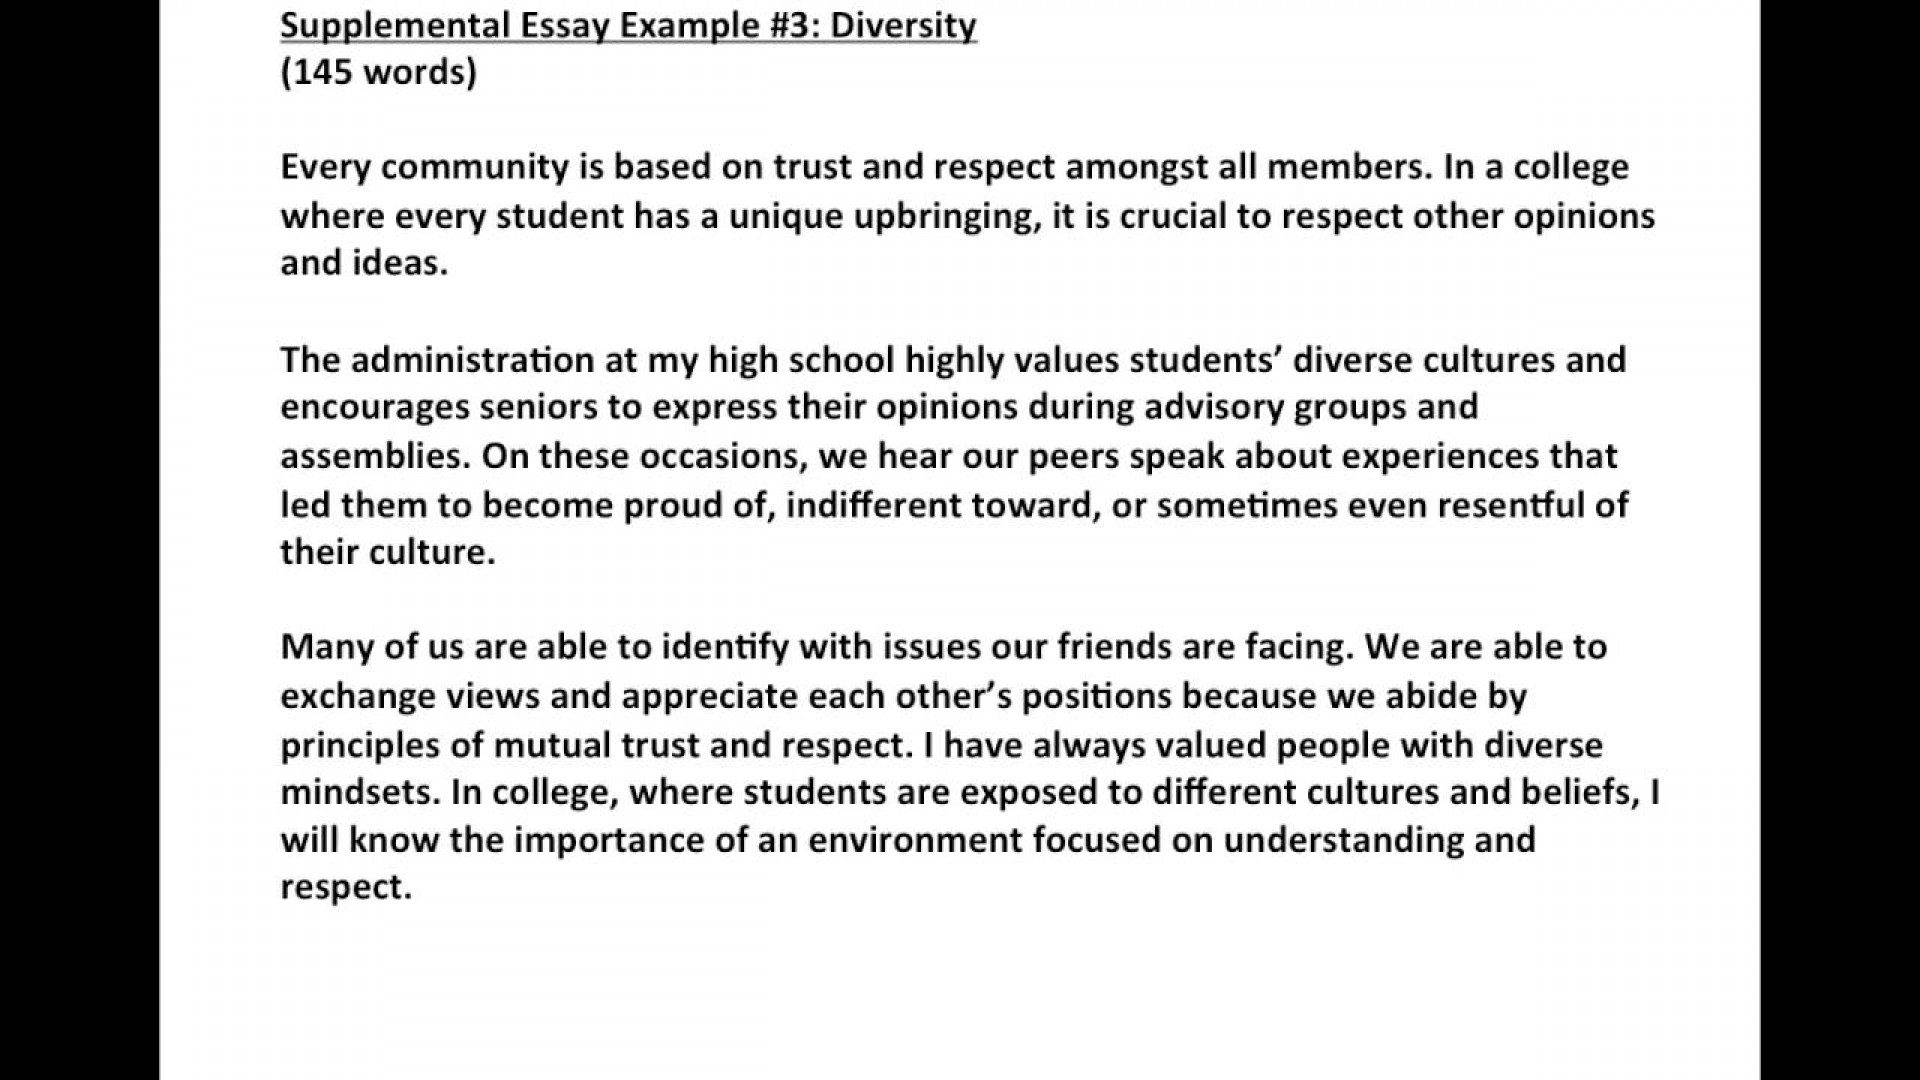 006 Diversity Essay Sample Maxresdefault Fascinating Law School 1920